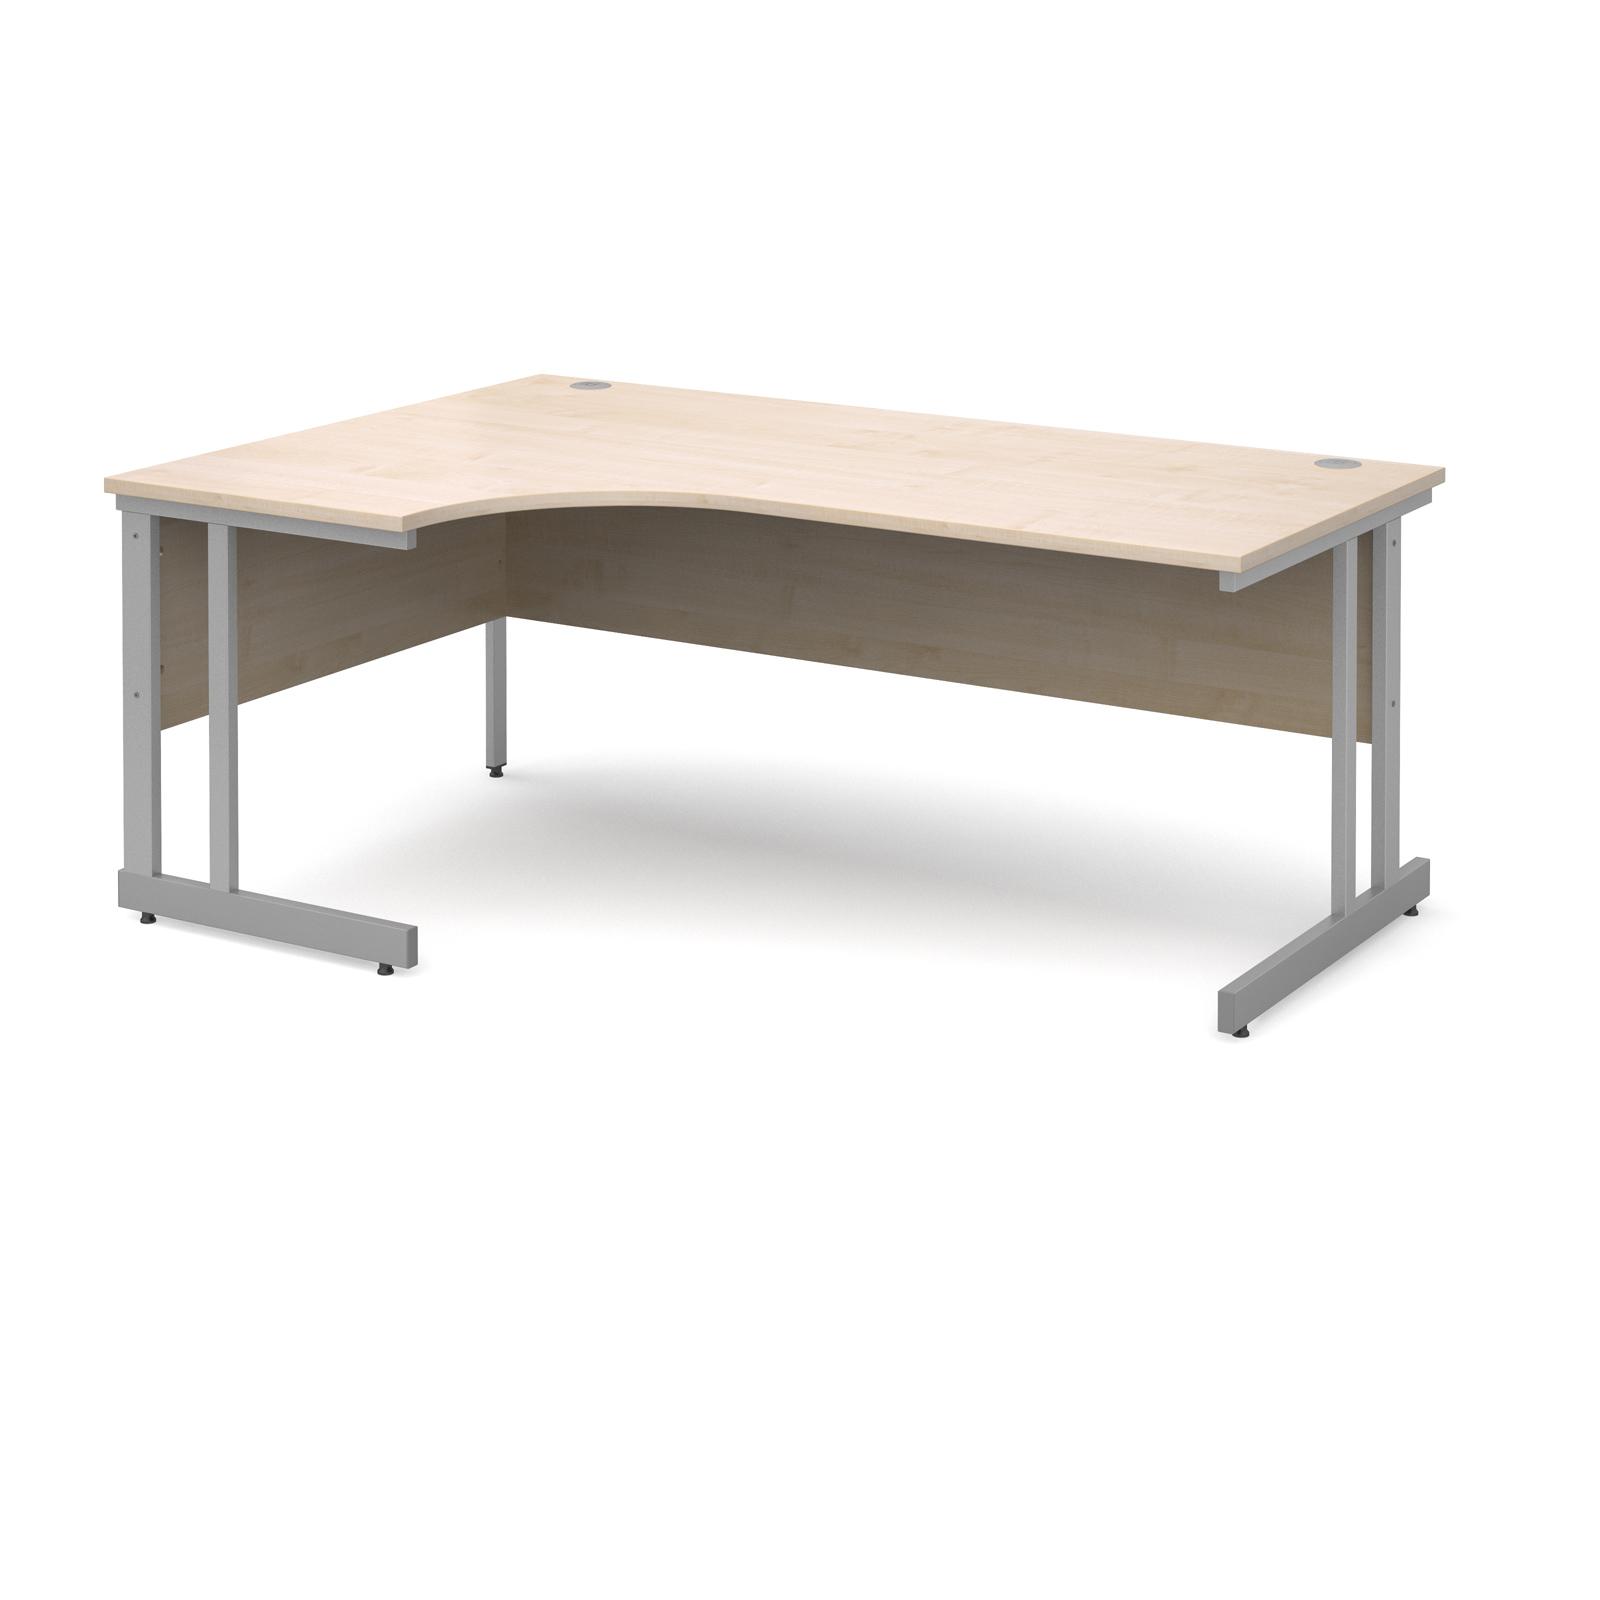 Momento left hand ergonomic desk 1800mm - silver cantilever frame, maple top